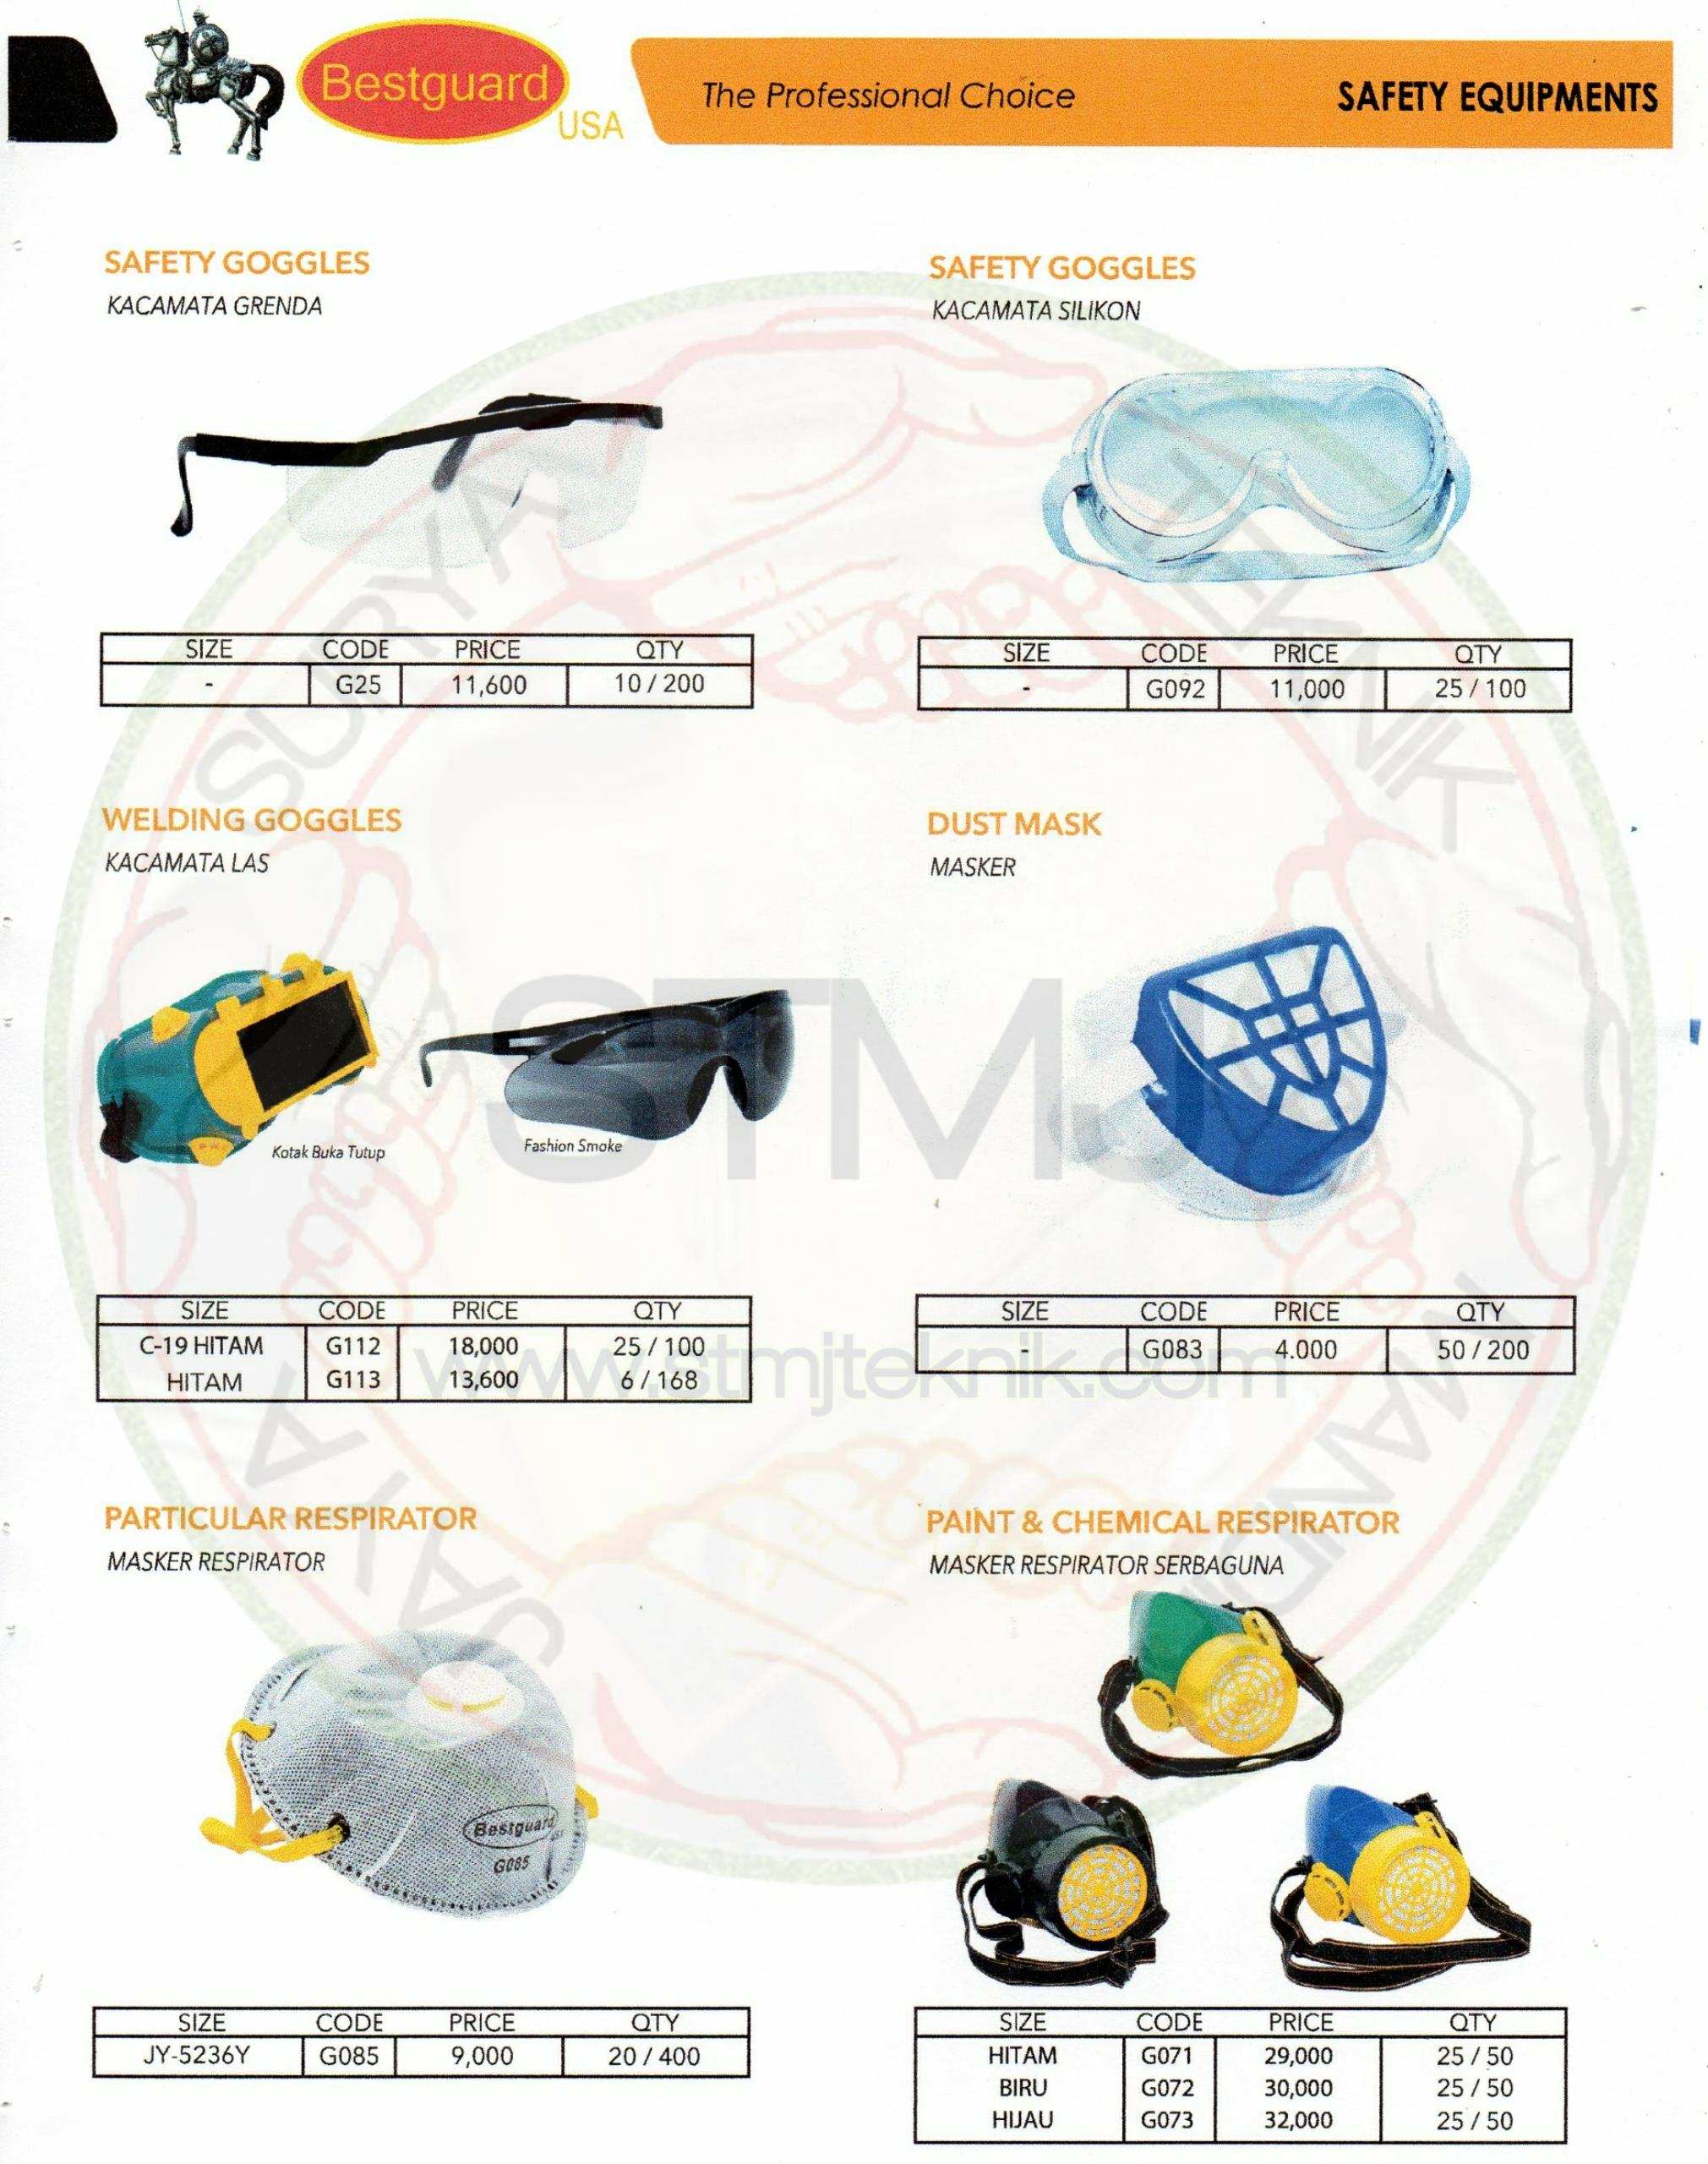 Bestguard Kacamata Las Safety Goggles Buka Tutup Daftar Harga Welding Google Glasses Kaca Mata Keamanan Perkakas Tool G112 Goggle Din 3 11 Source Jual Gerinda Dan Masker